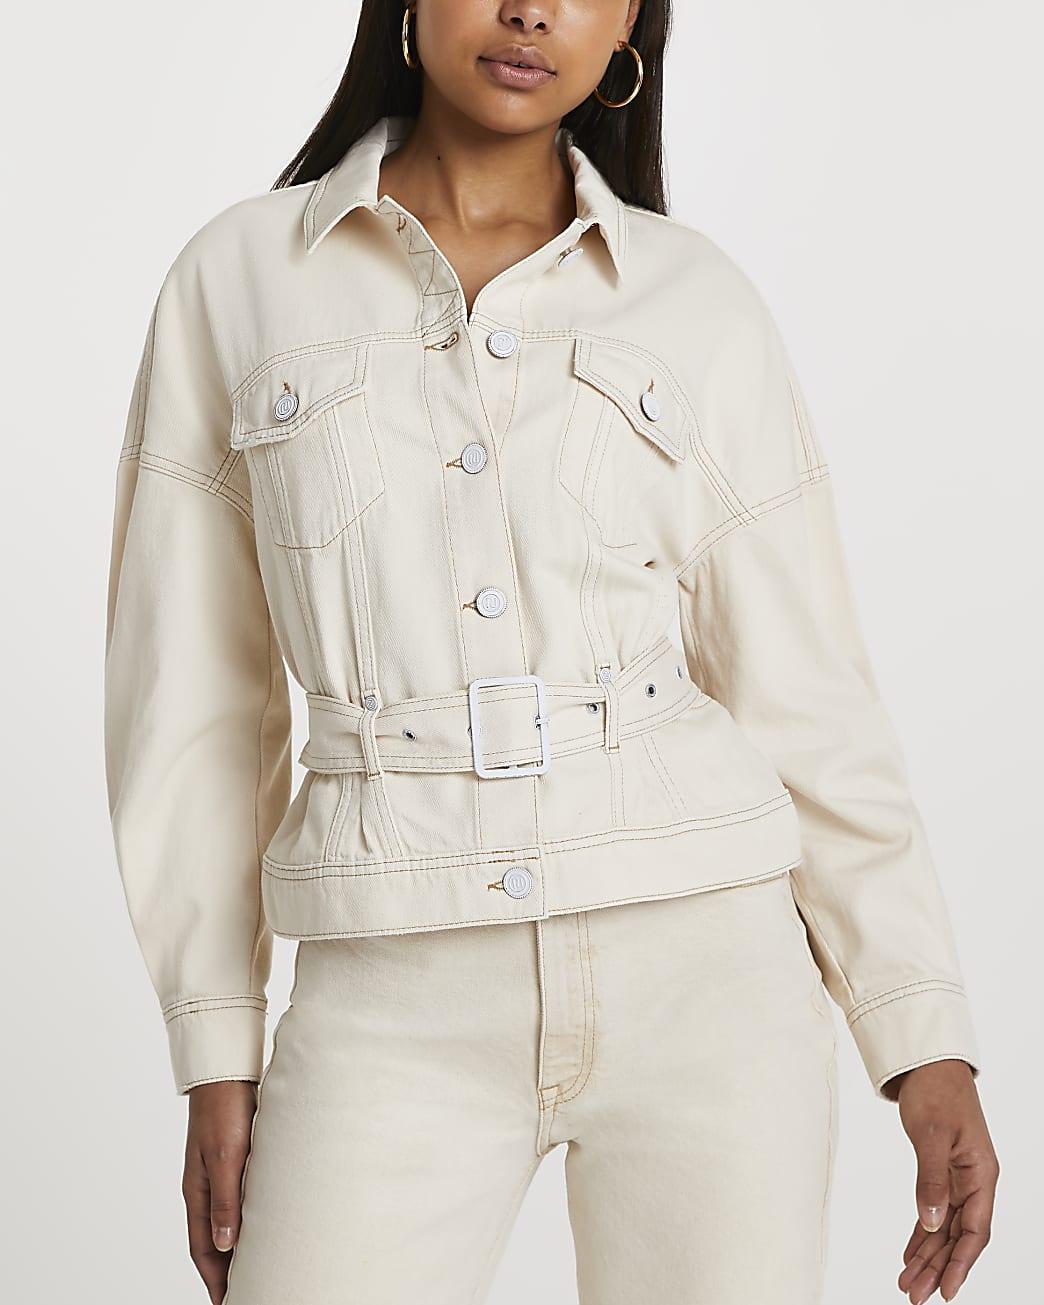 Cream long sleeve belted peplum jacket